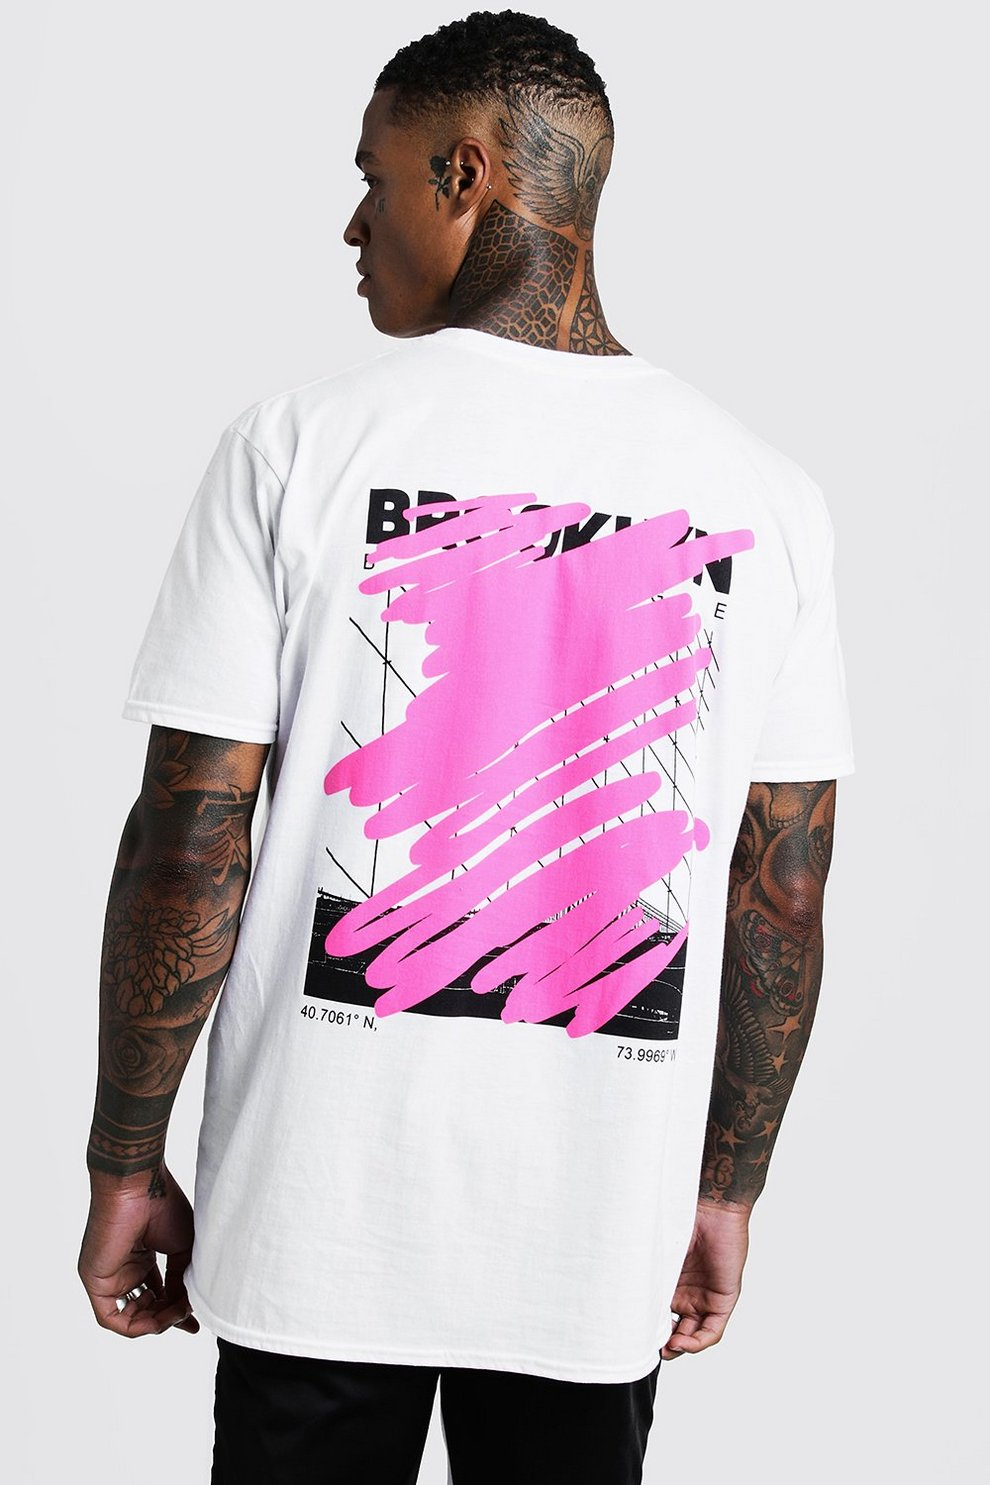 663c6ad1c MAN Oversized Graffiti Back Print T-Shirt | Boohoo